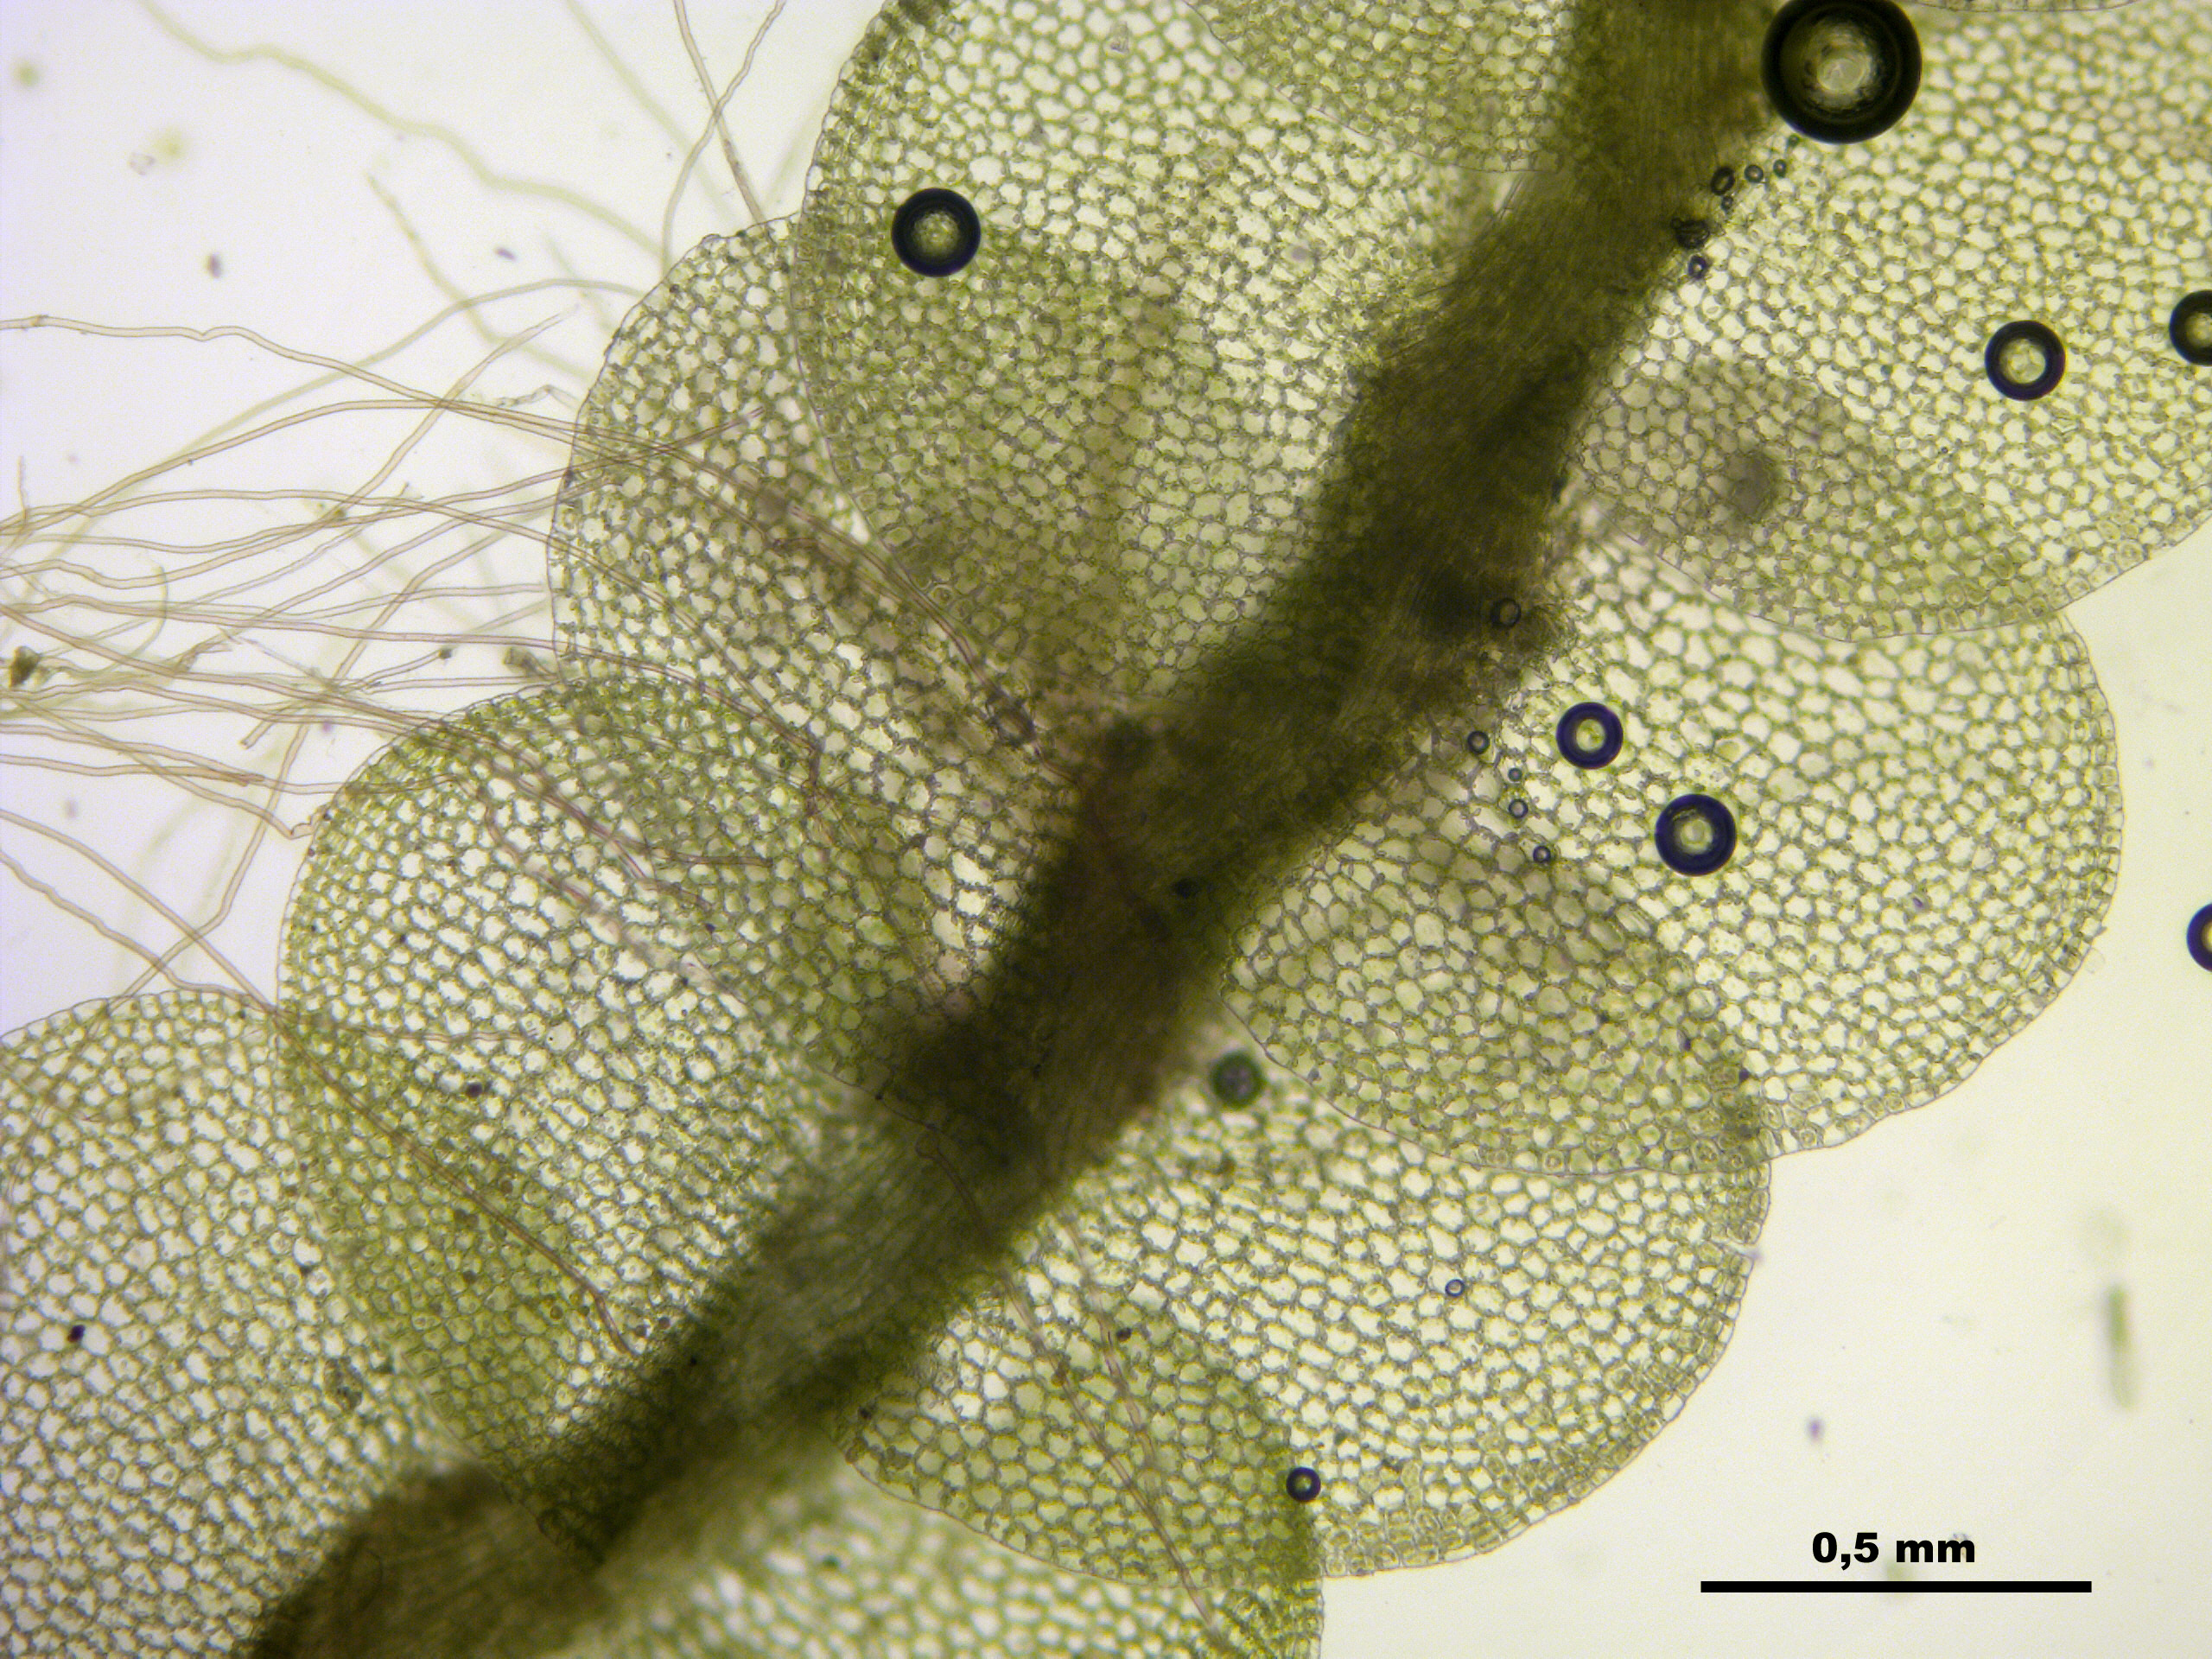 FileJungermannia Hyalina A 113308 471324 2470JPG